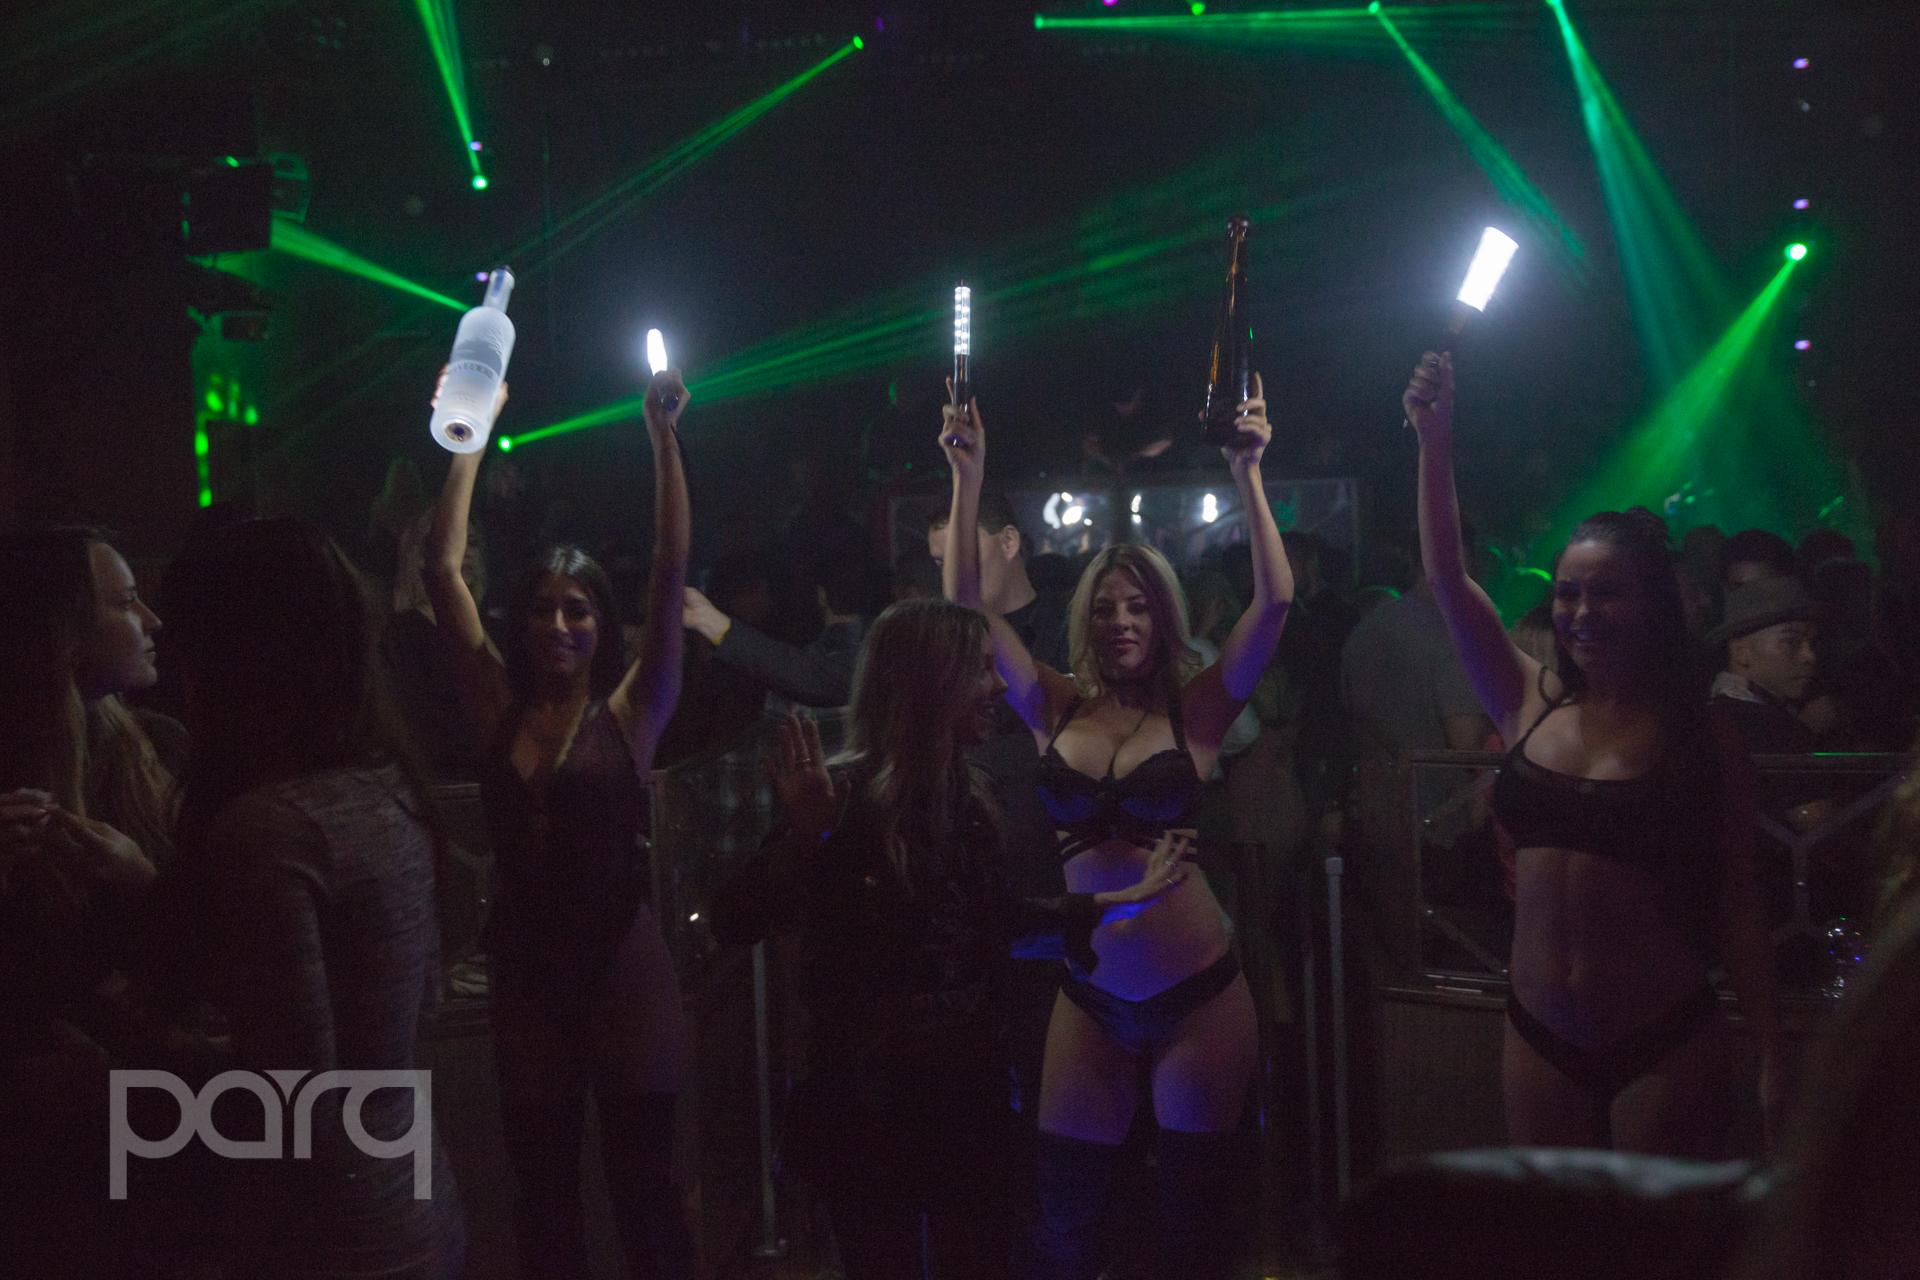 San-Diego-Nightclub-Sid Vicious-3.jpg